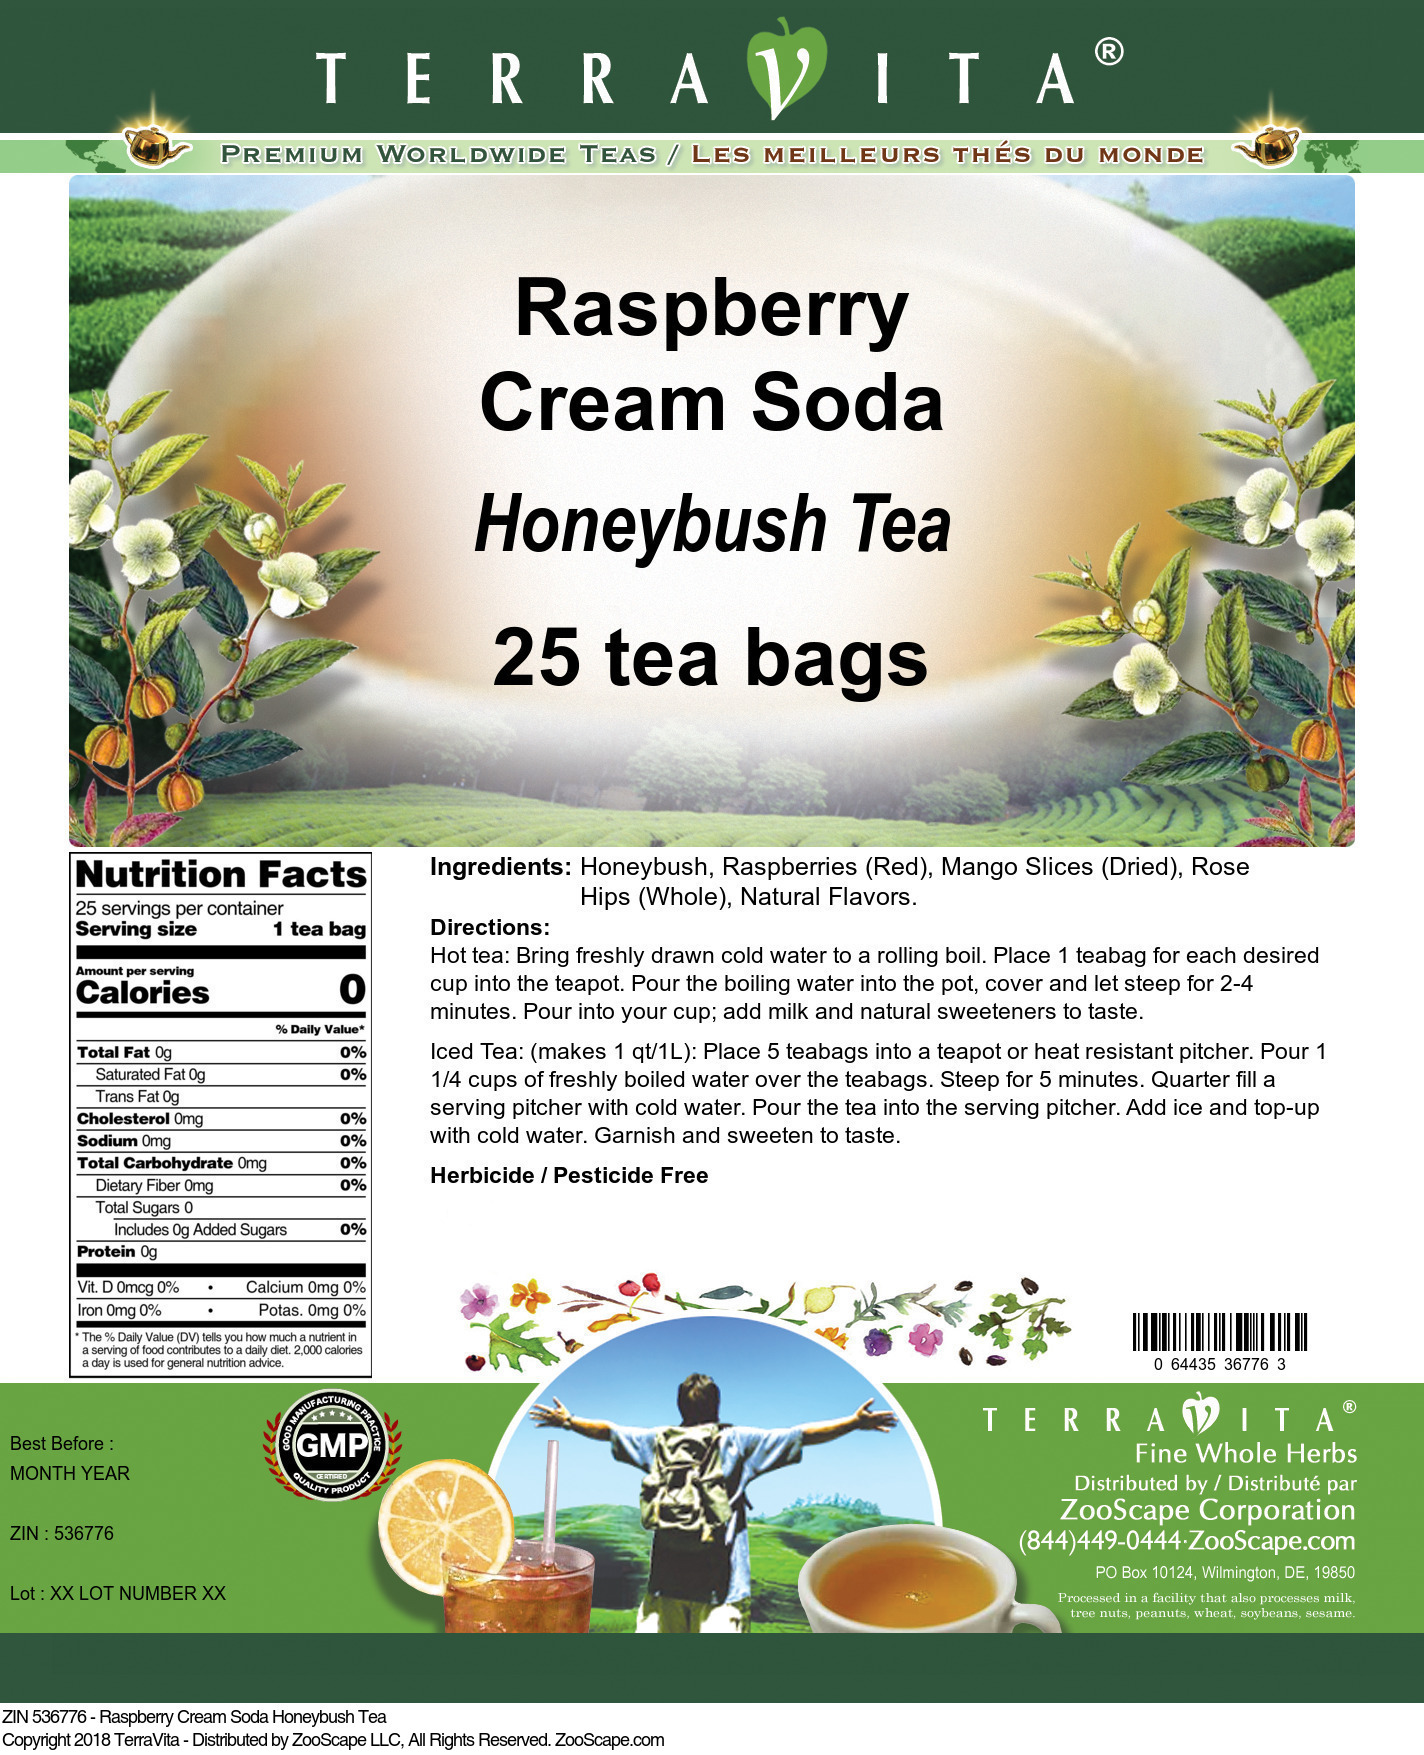 Raspberry Cream Soda Honeybush Tea